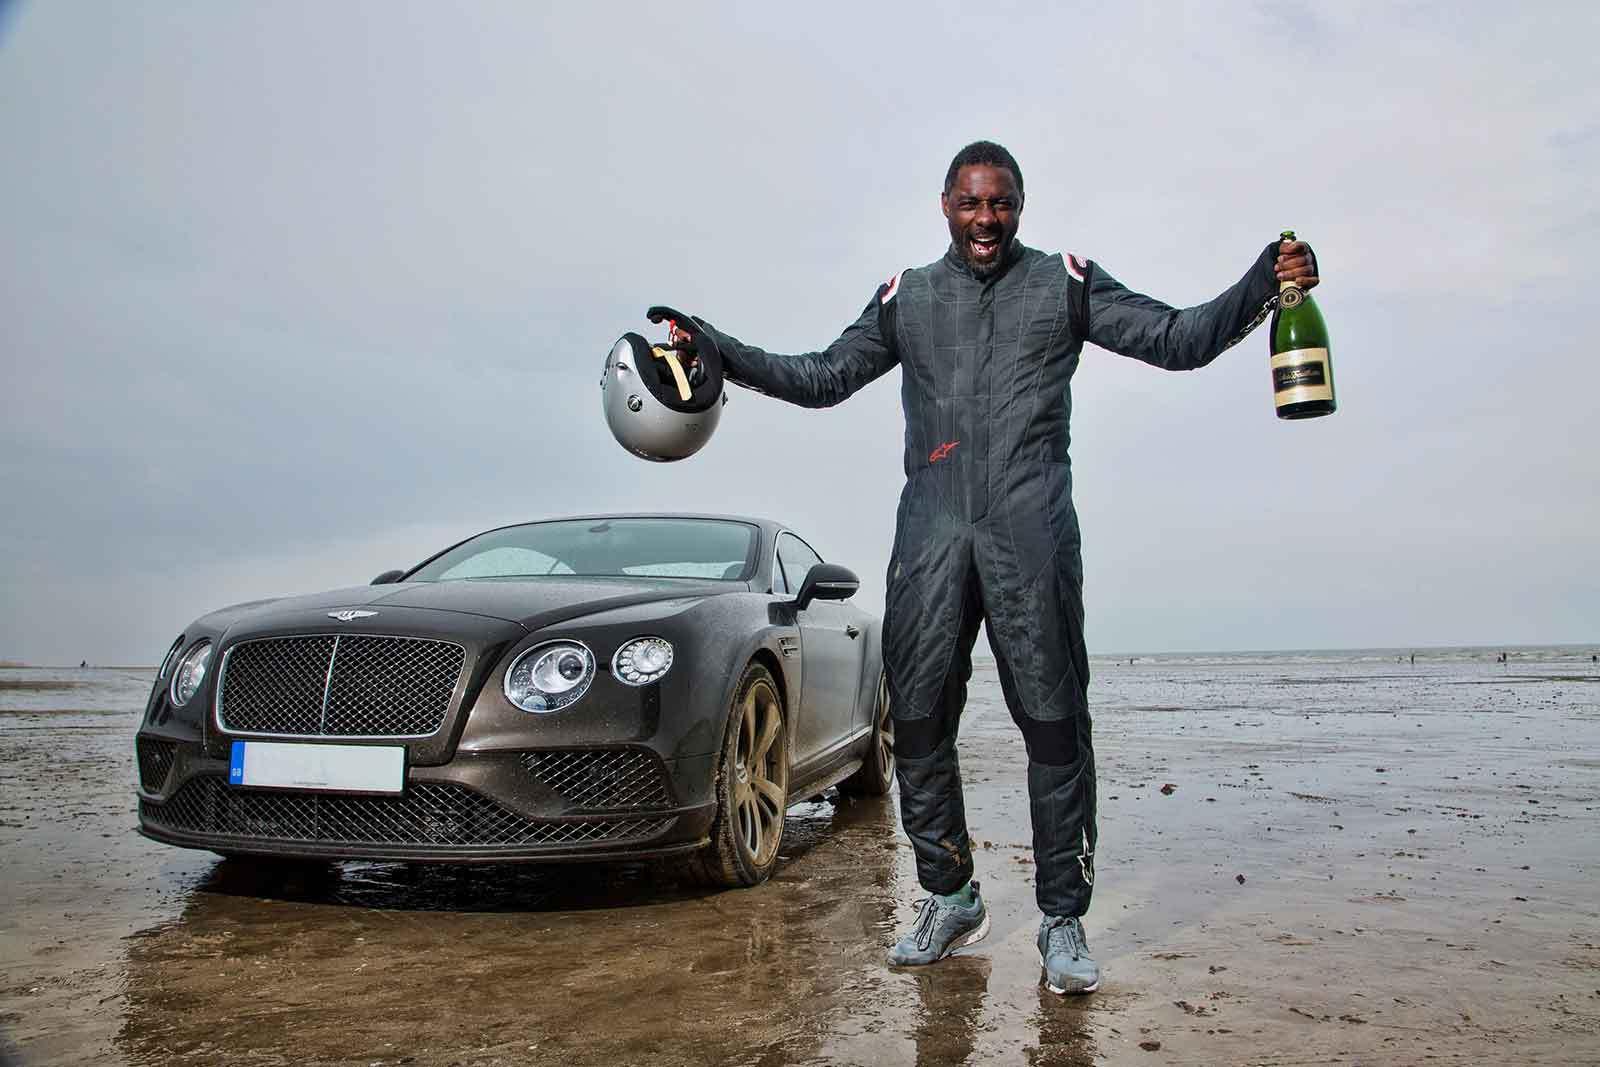 Idris Elba breaks 'Flying Mile' at legendary land speed location Pendine Sands in Bentley Continental GT Speed